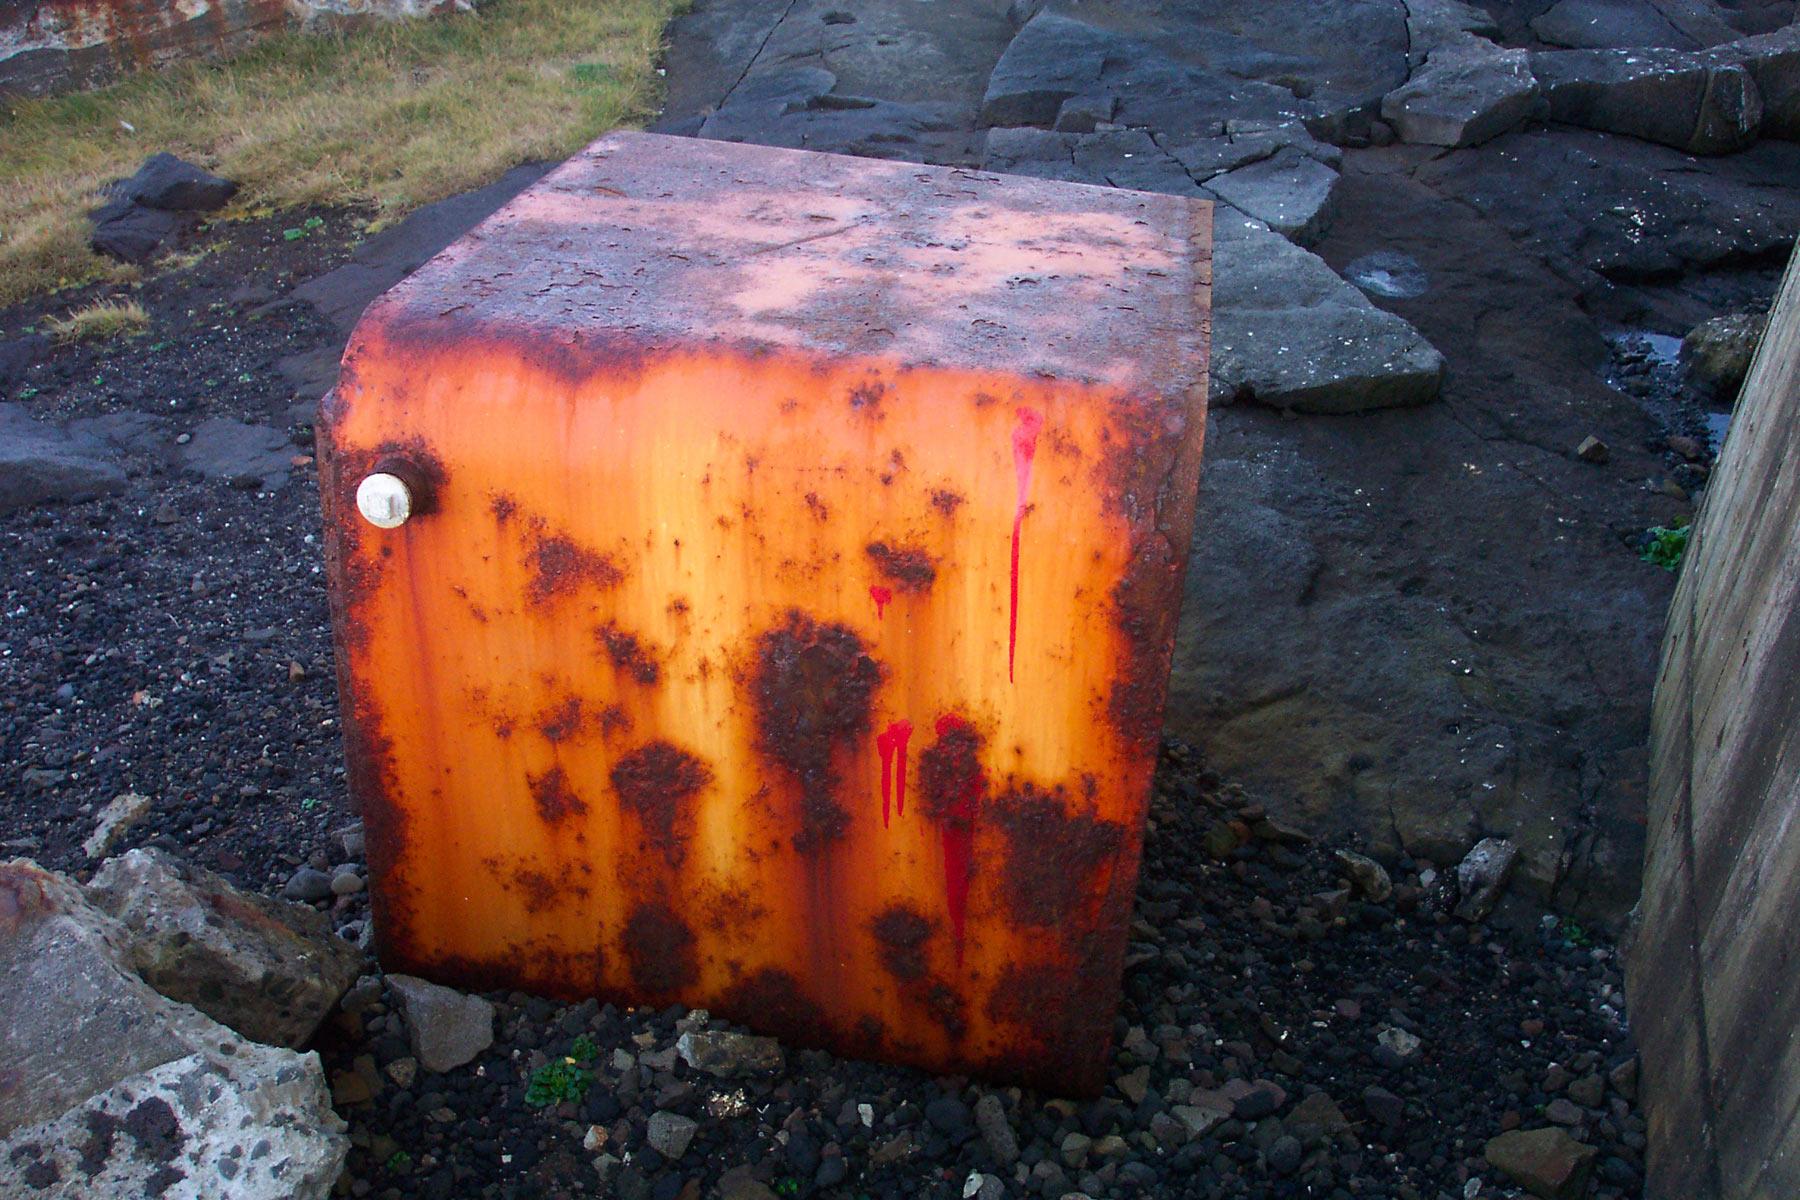 Rusted steel tank, Corroded, Metallic, Rocks, Rust, HQ Photo